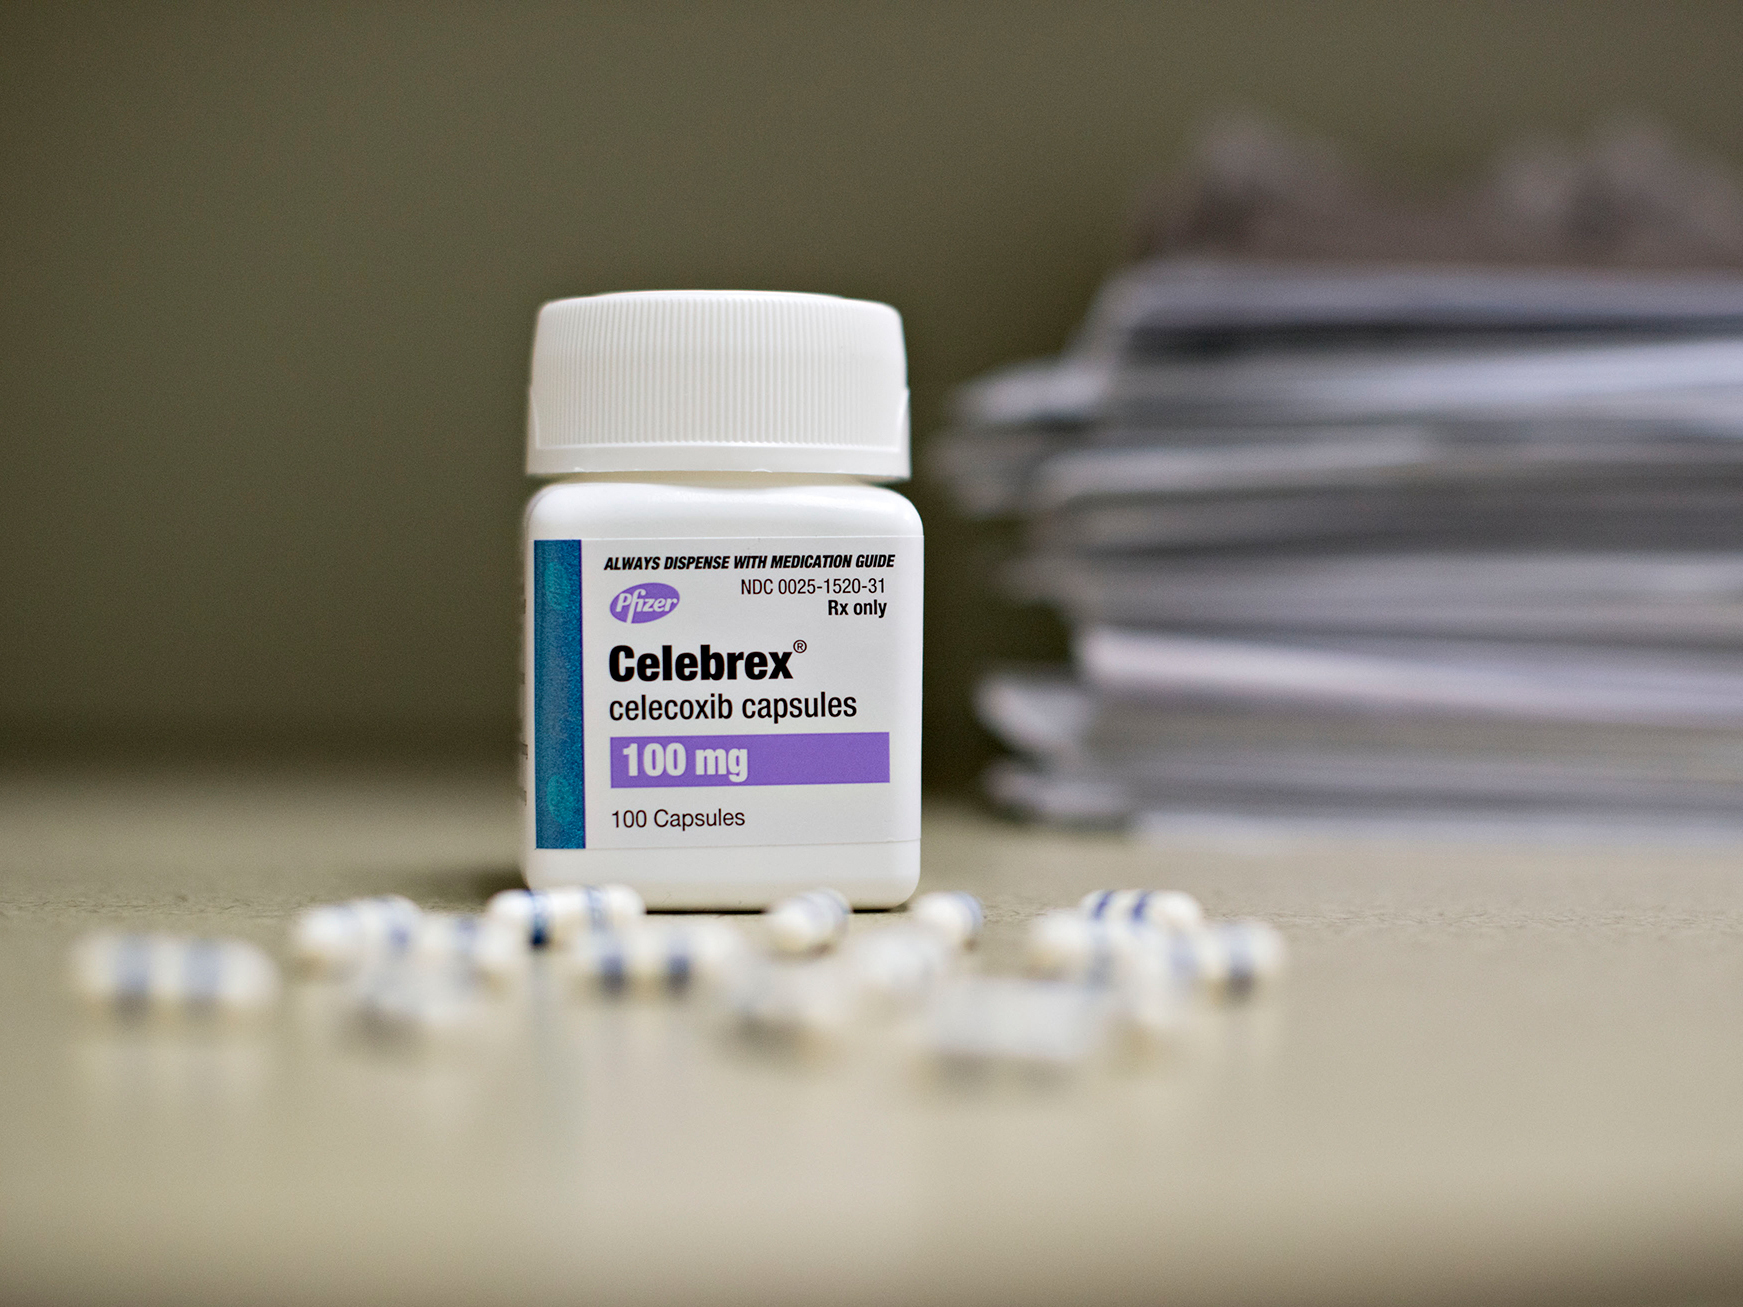 Celebrex As Safe As Ibuprofen And Naproxen, FDA Advisers Say : Shots -  Health News : NPR